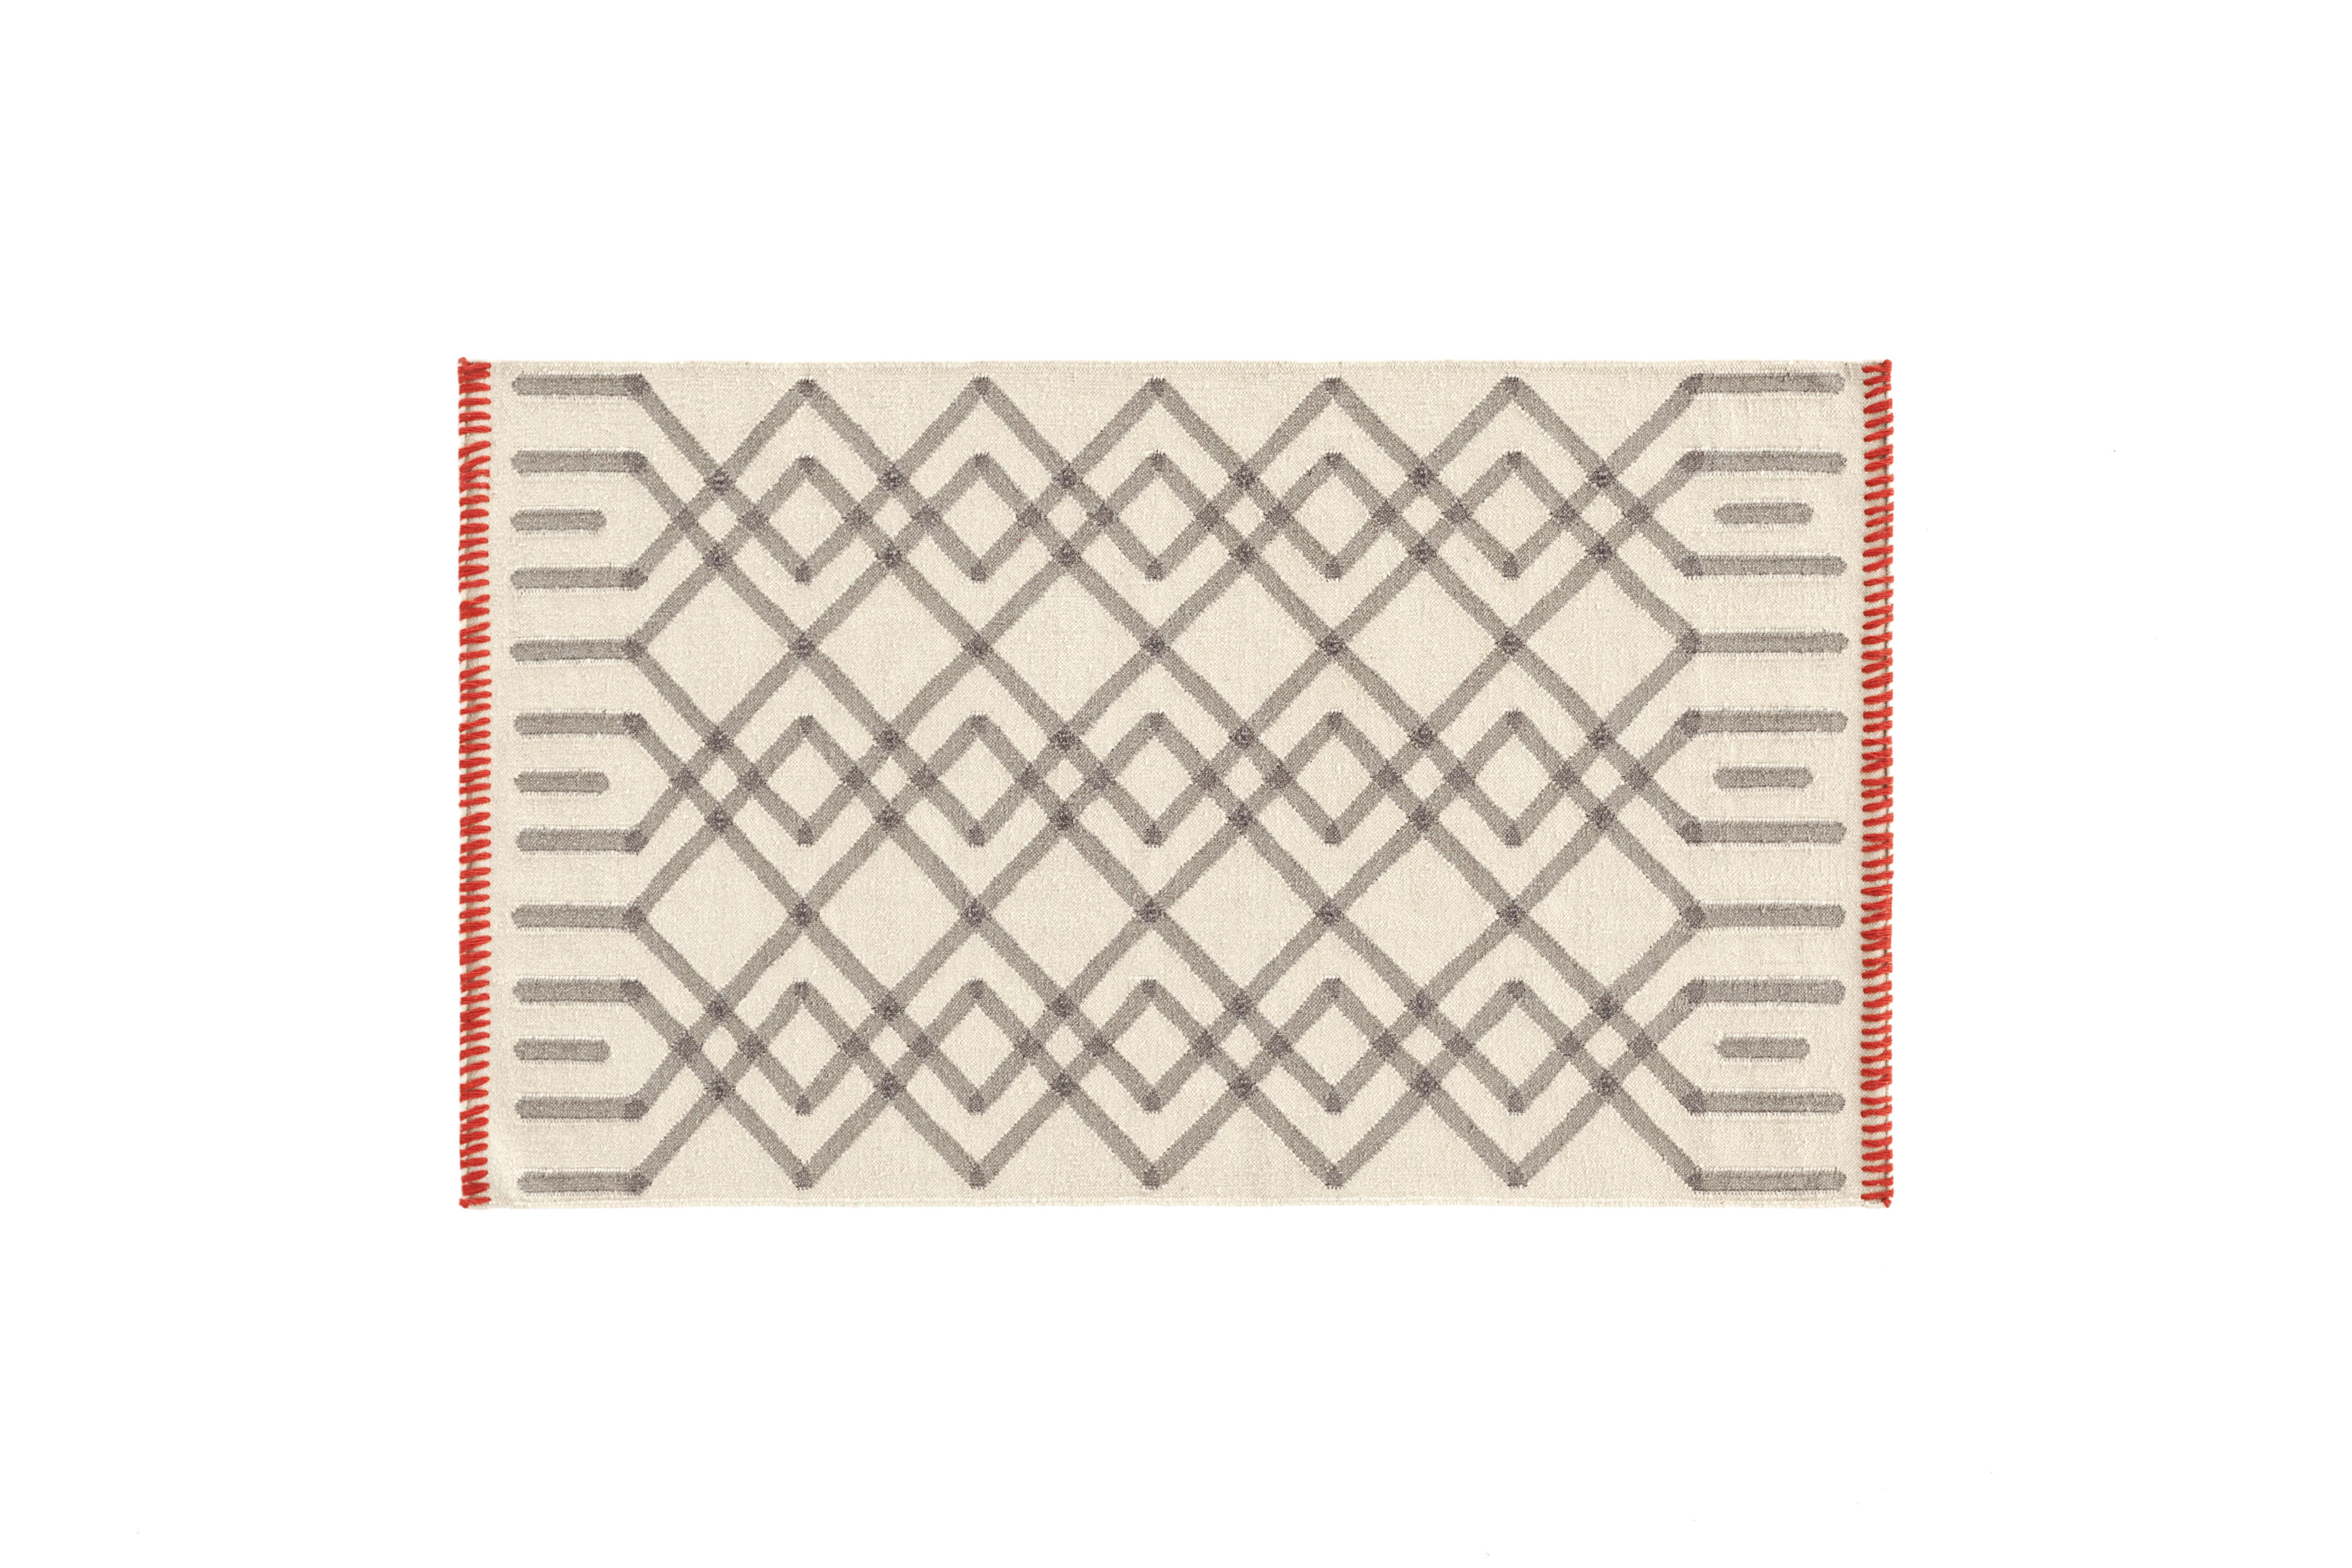 Gandia blasco duna handmade kilim wool gris area rug wayfair